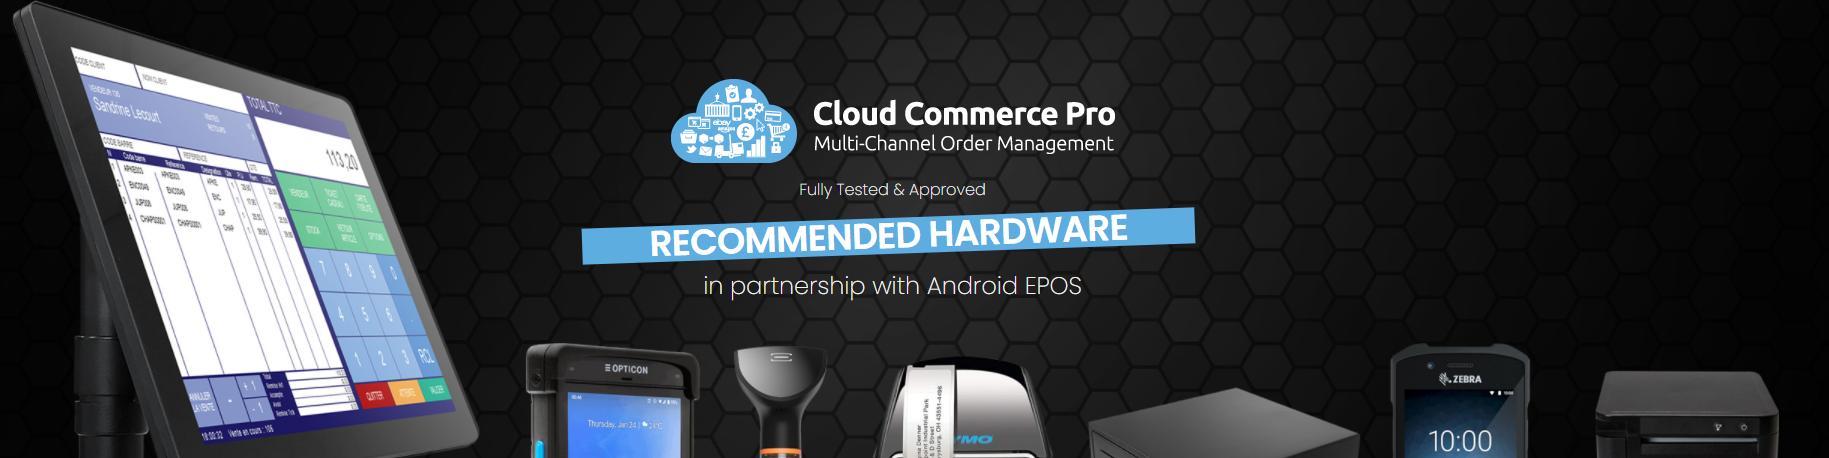 Hardware Partnership